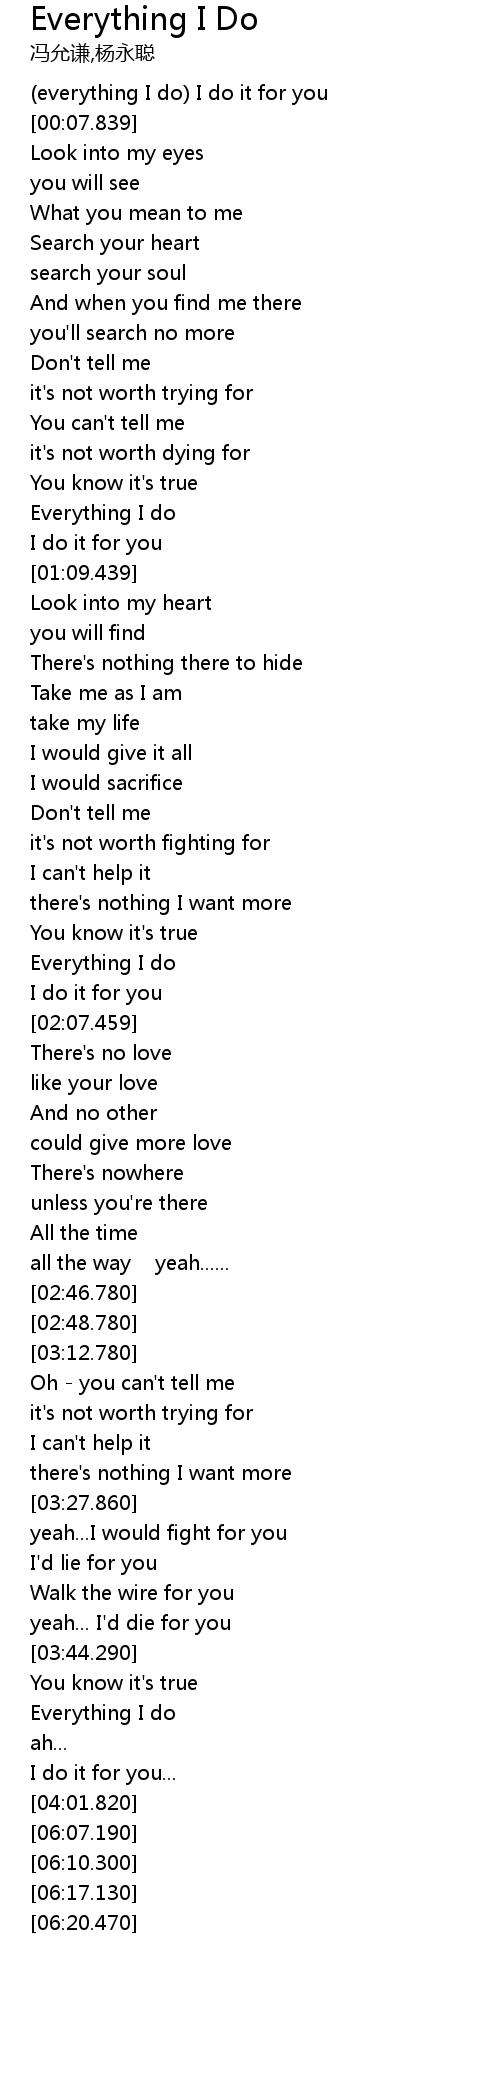 Everything I Do Lyrics Follow Lyrics